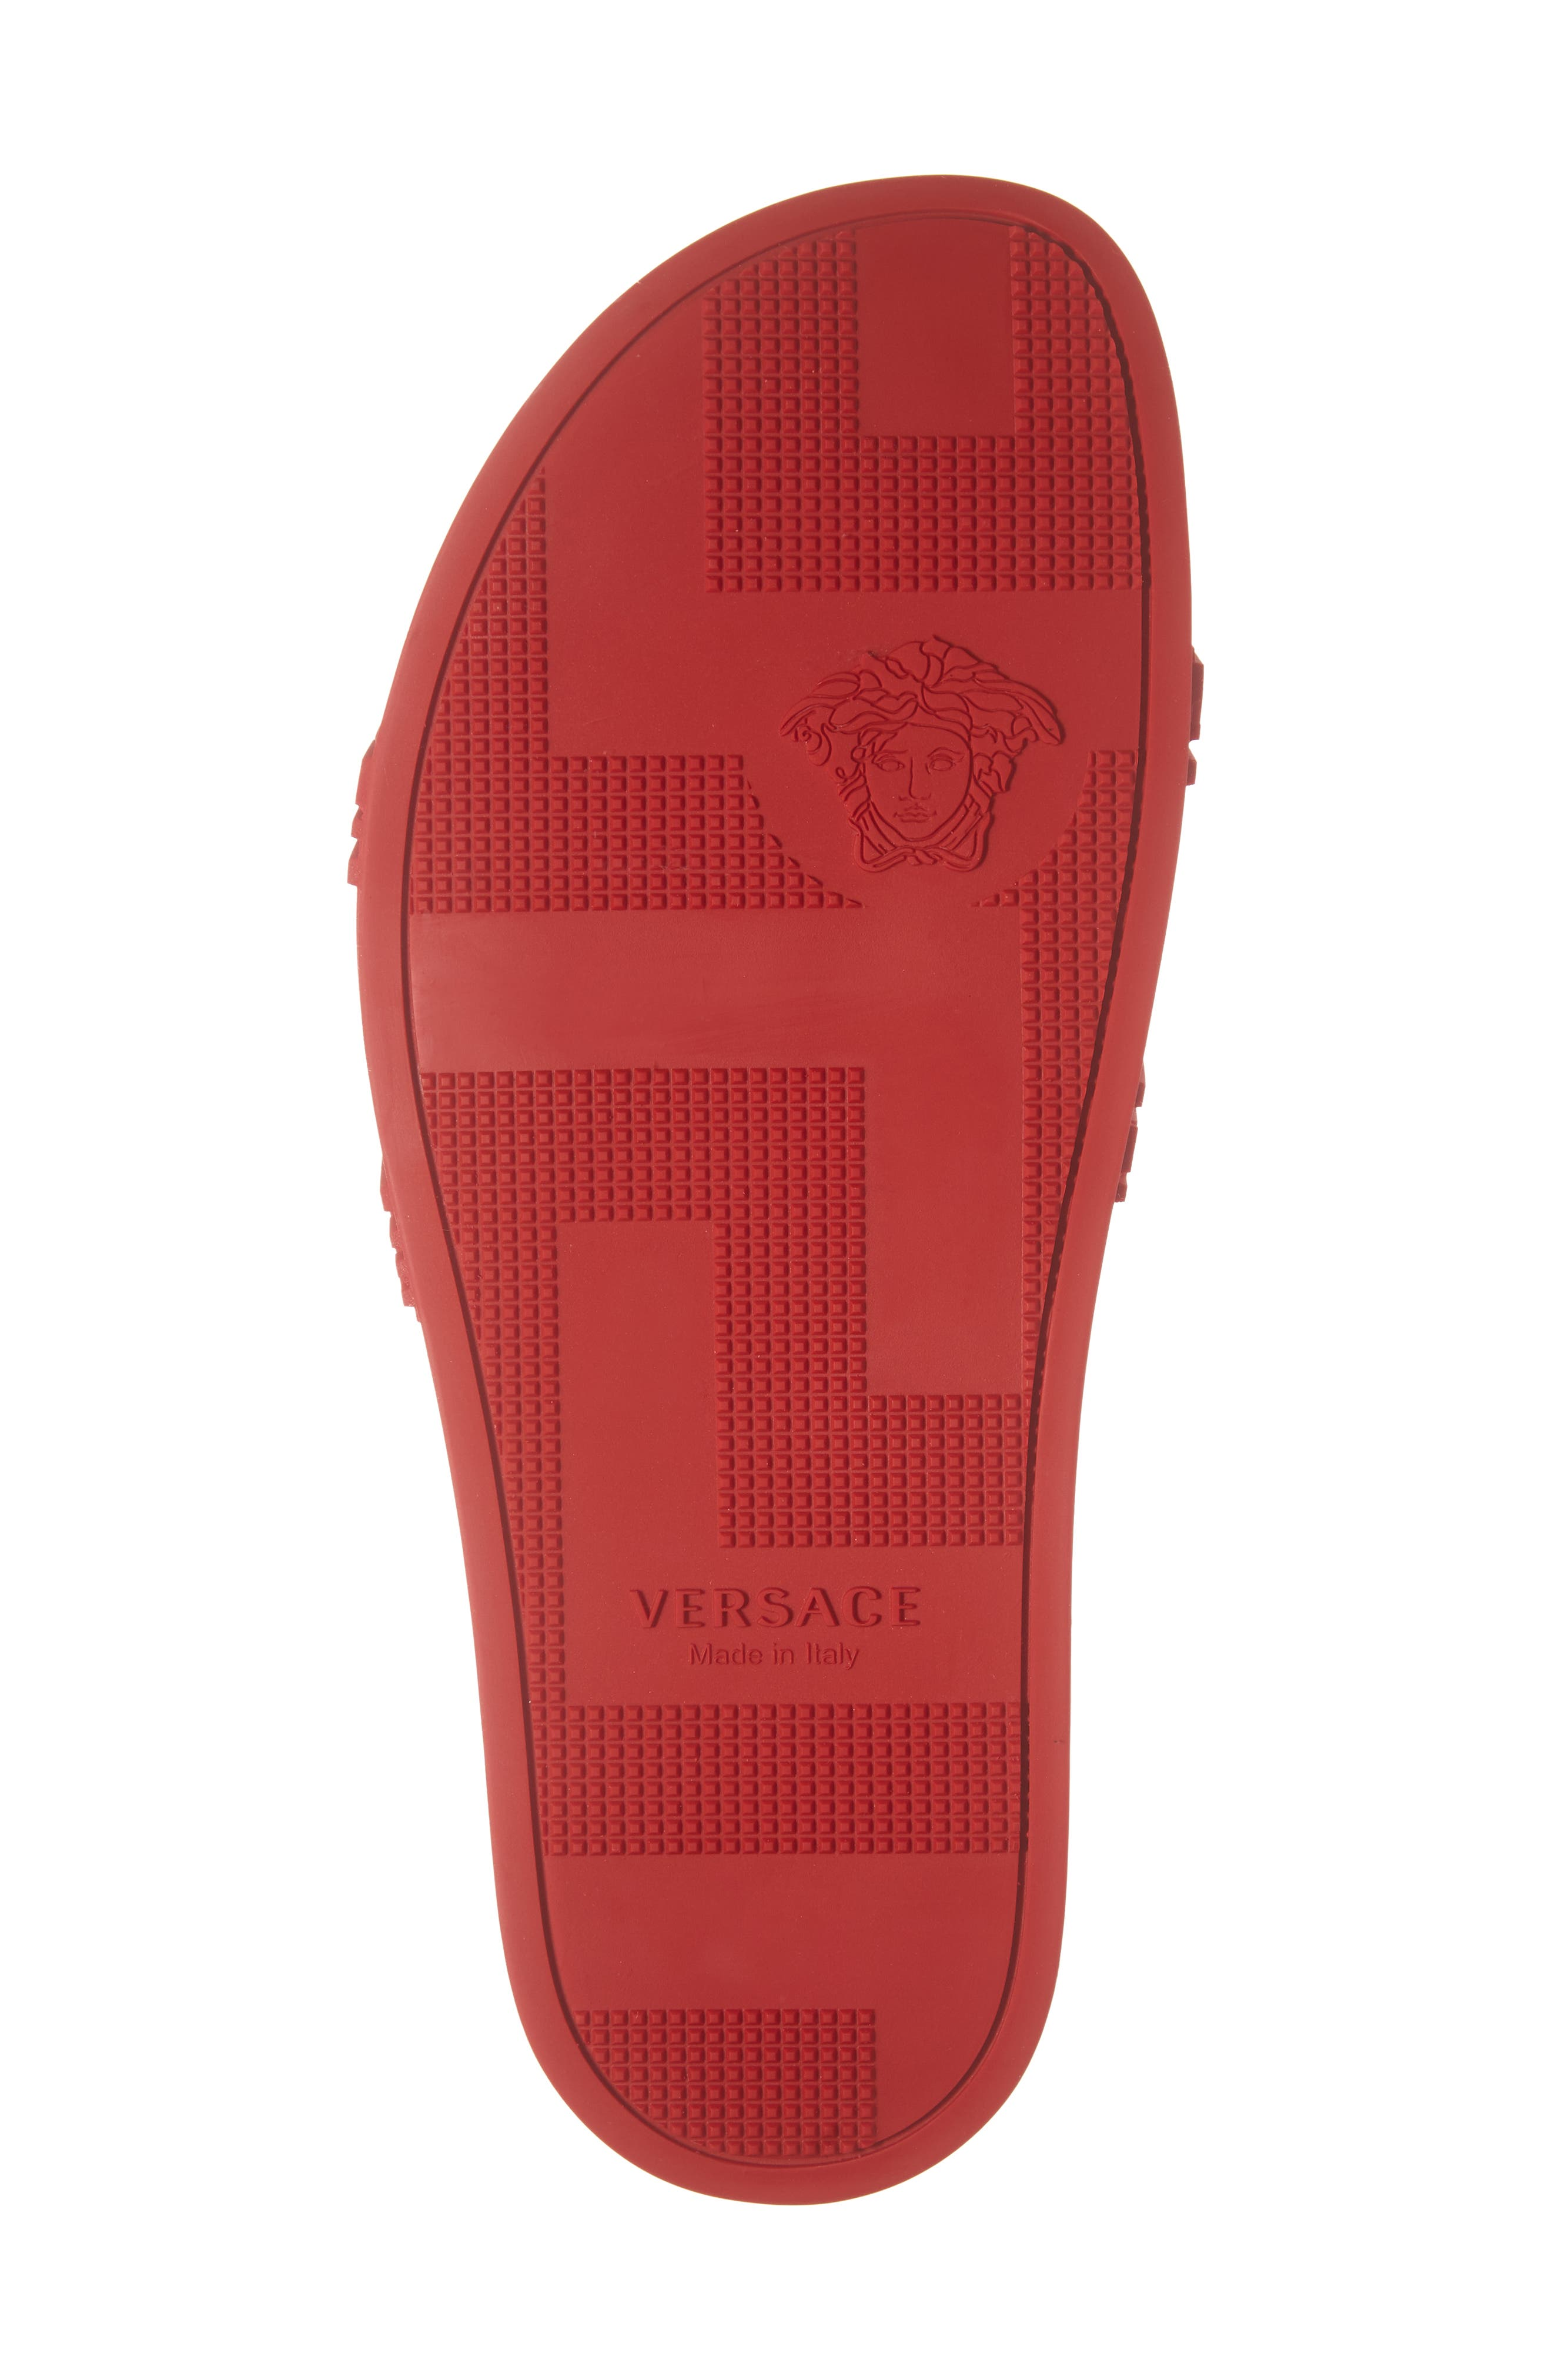 VERSACE, Palazzo Medusa Slide Sandal, Alternate thumbnail 6, color, RED